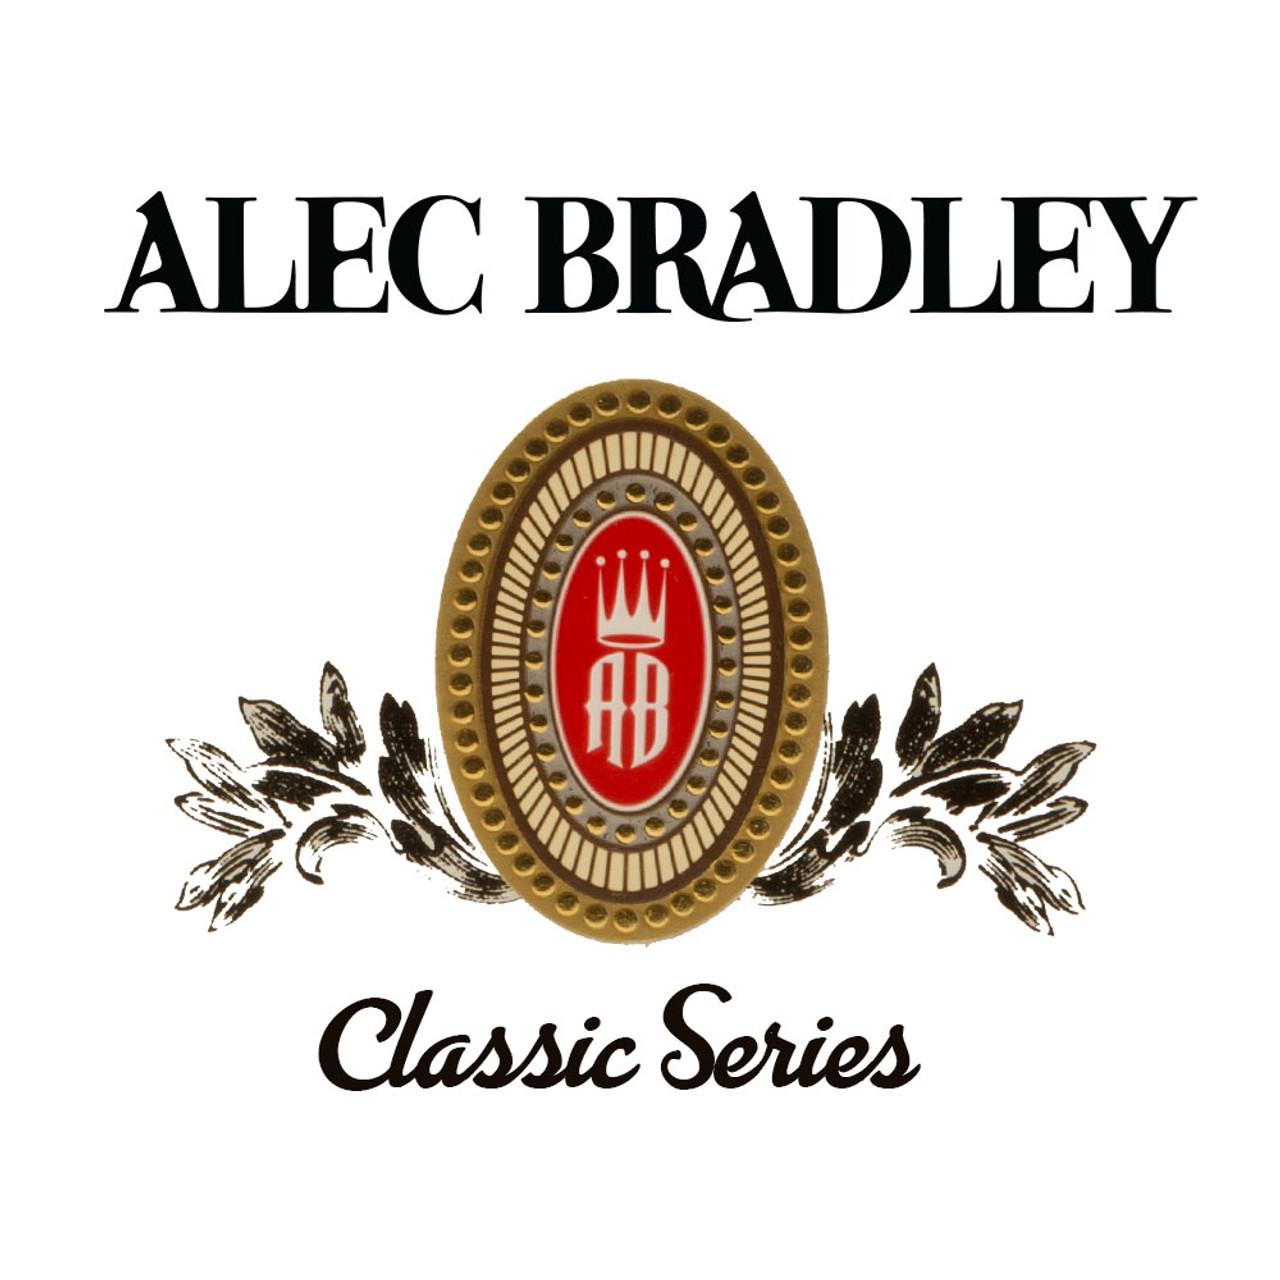 Alec Bradley Classic Series Nicaraguan Robusto Cigars - 5 x 50 (Box of 20)